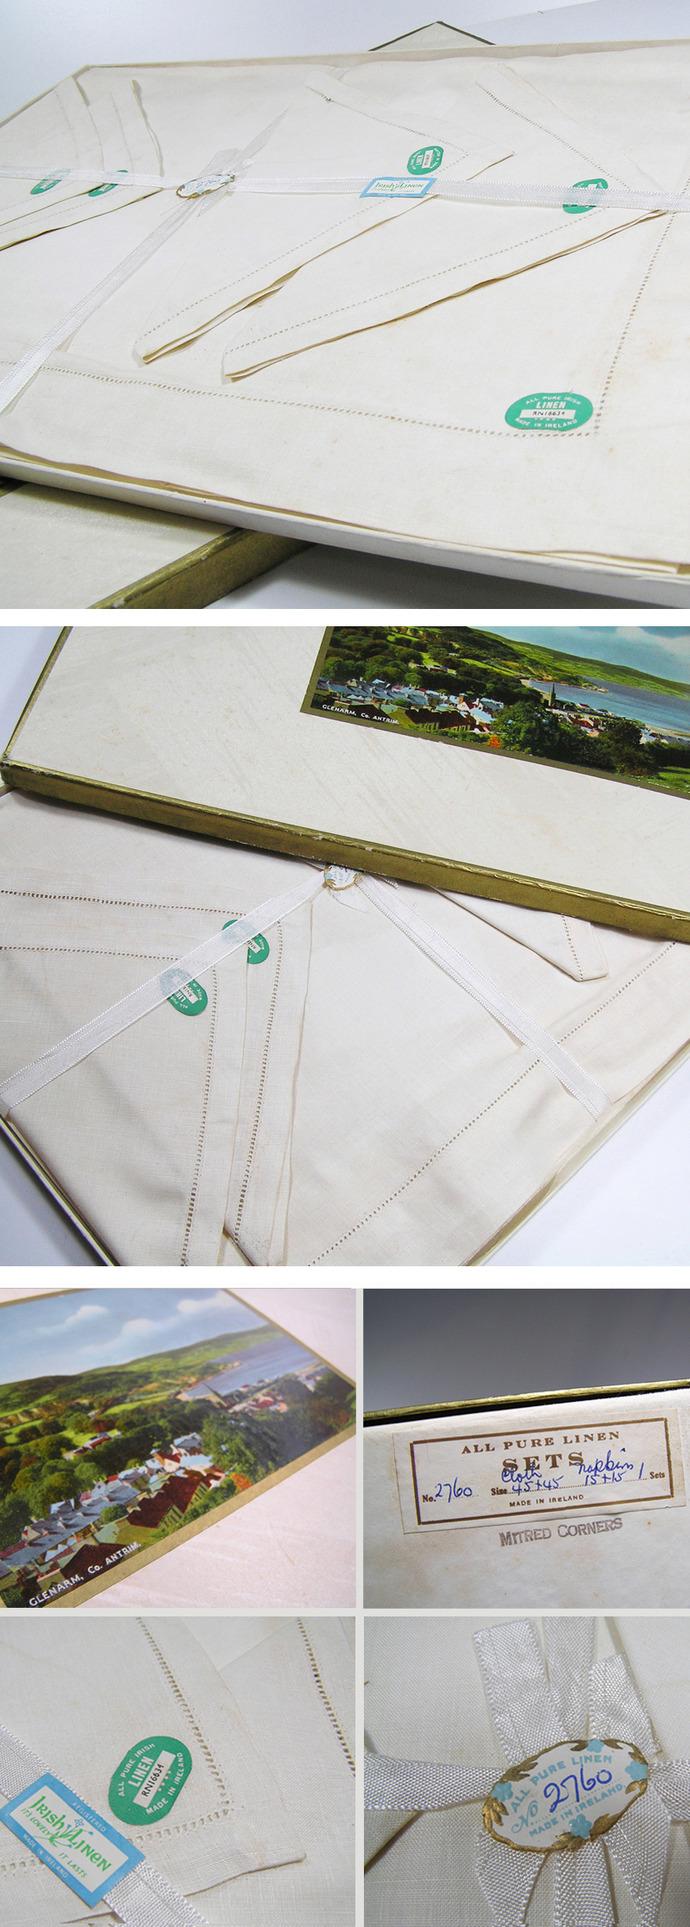 Irish linen napkin and table cloth set, still in original vintage box.